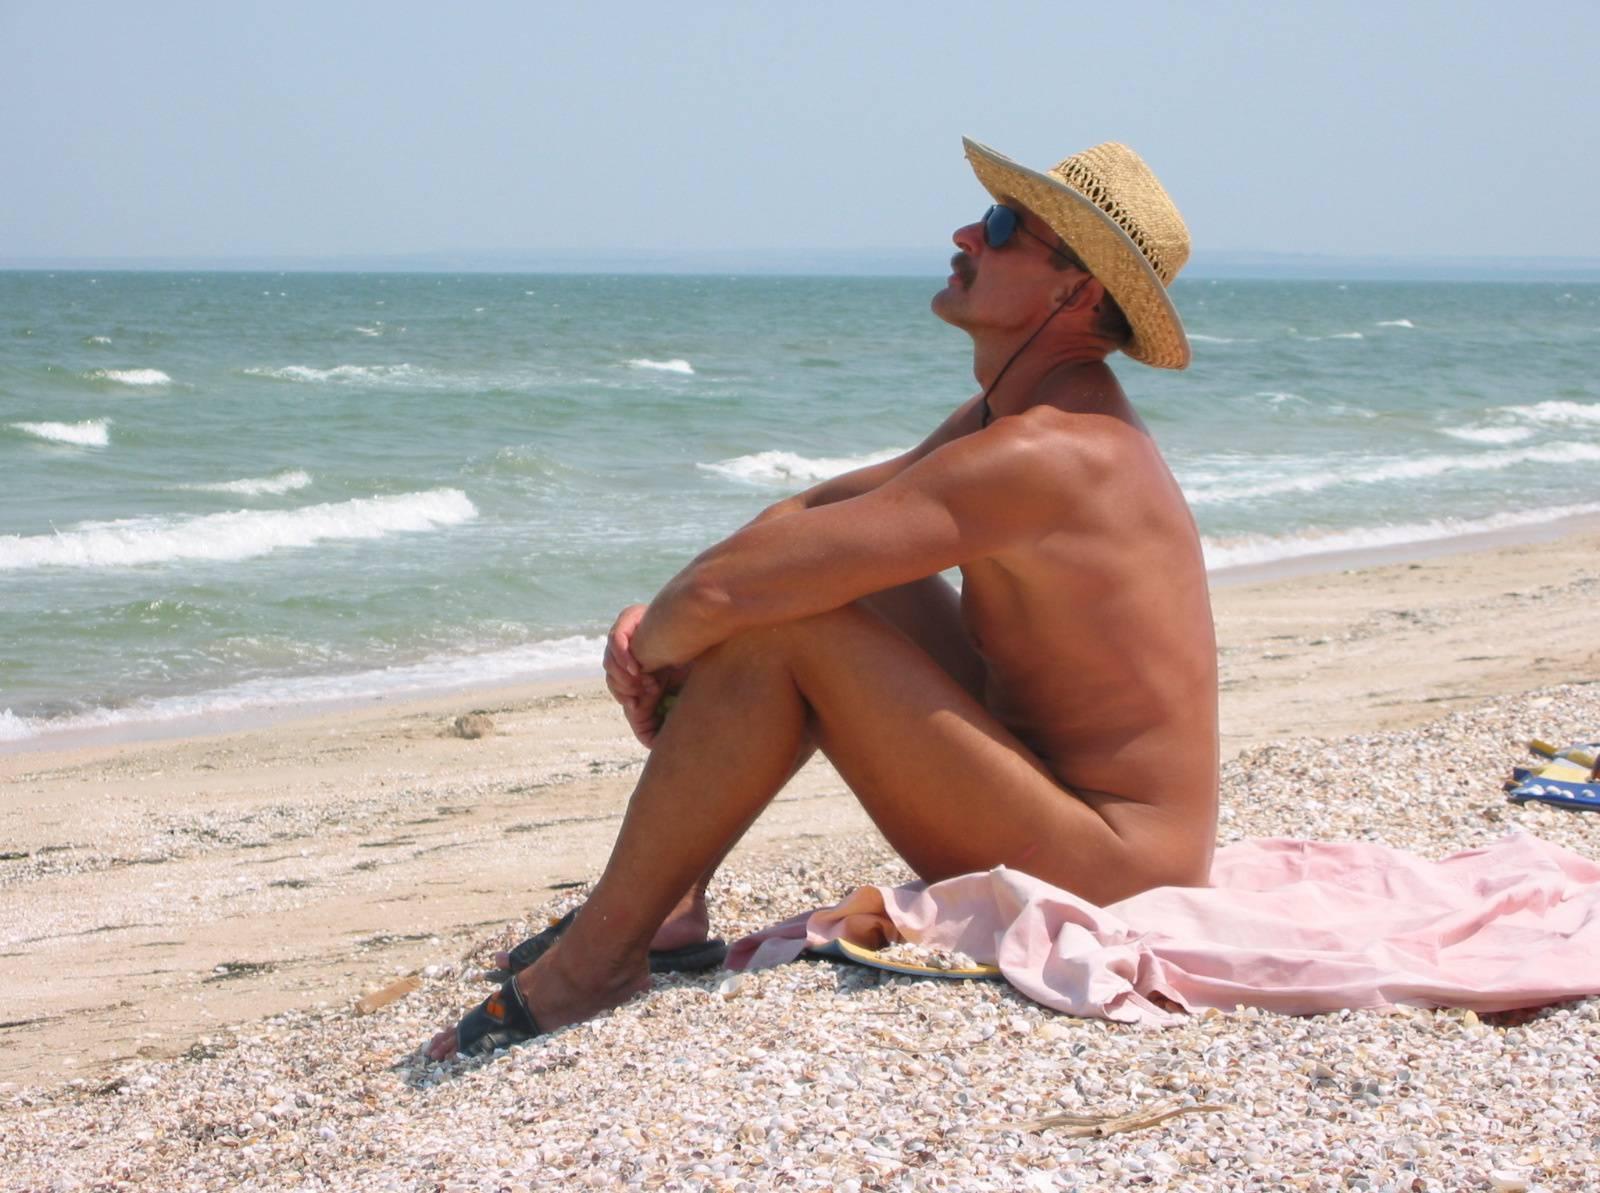 Nudist Photos Nudist Living Shore Profile - 2